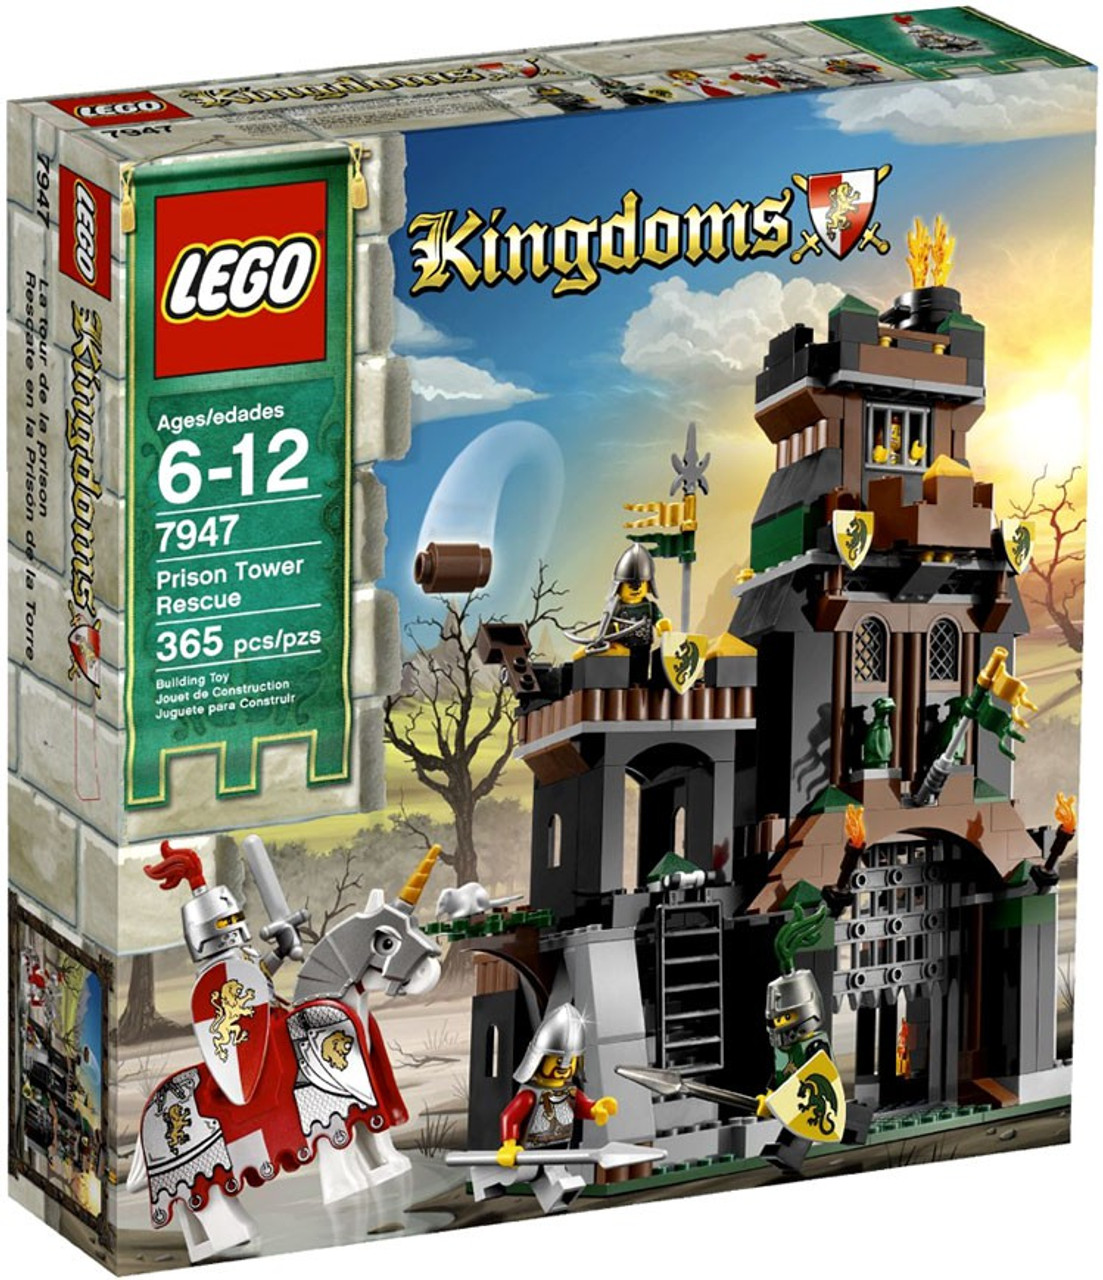 LEGO Kingdoms Prison Tower Rescue Set 7947 ToyWiz